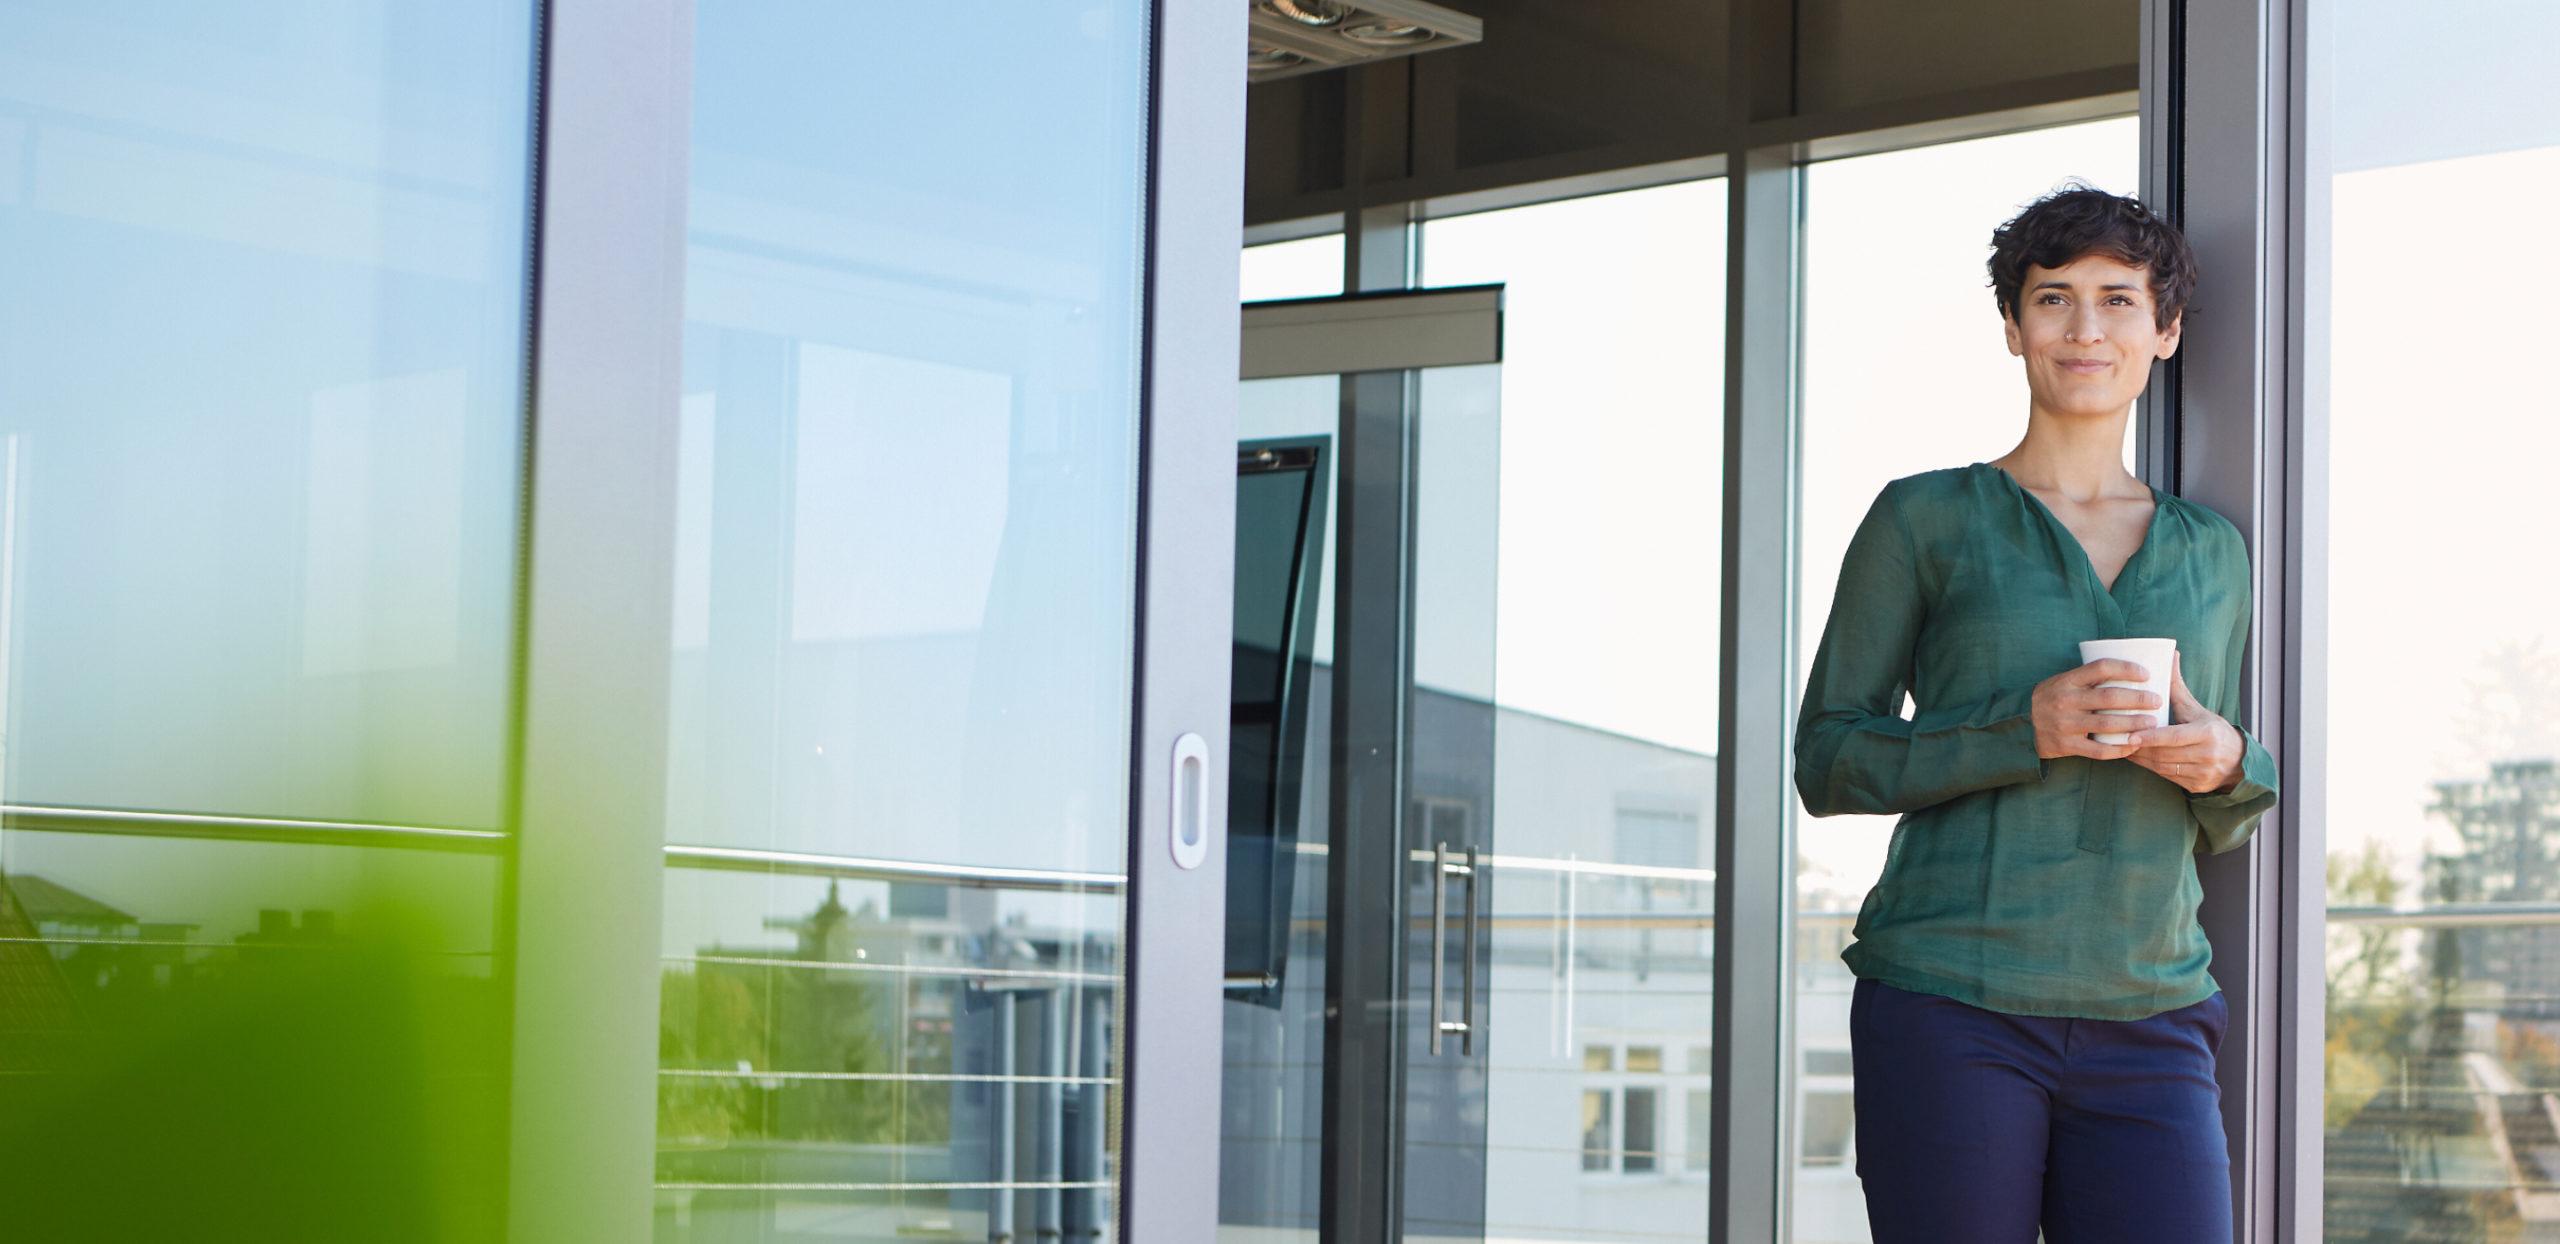 BNP Paribas Macstone Übersicht Frau mit Kaffee im Bürogebäude